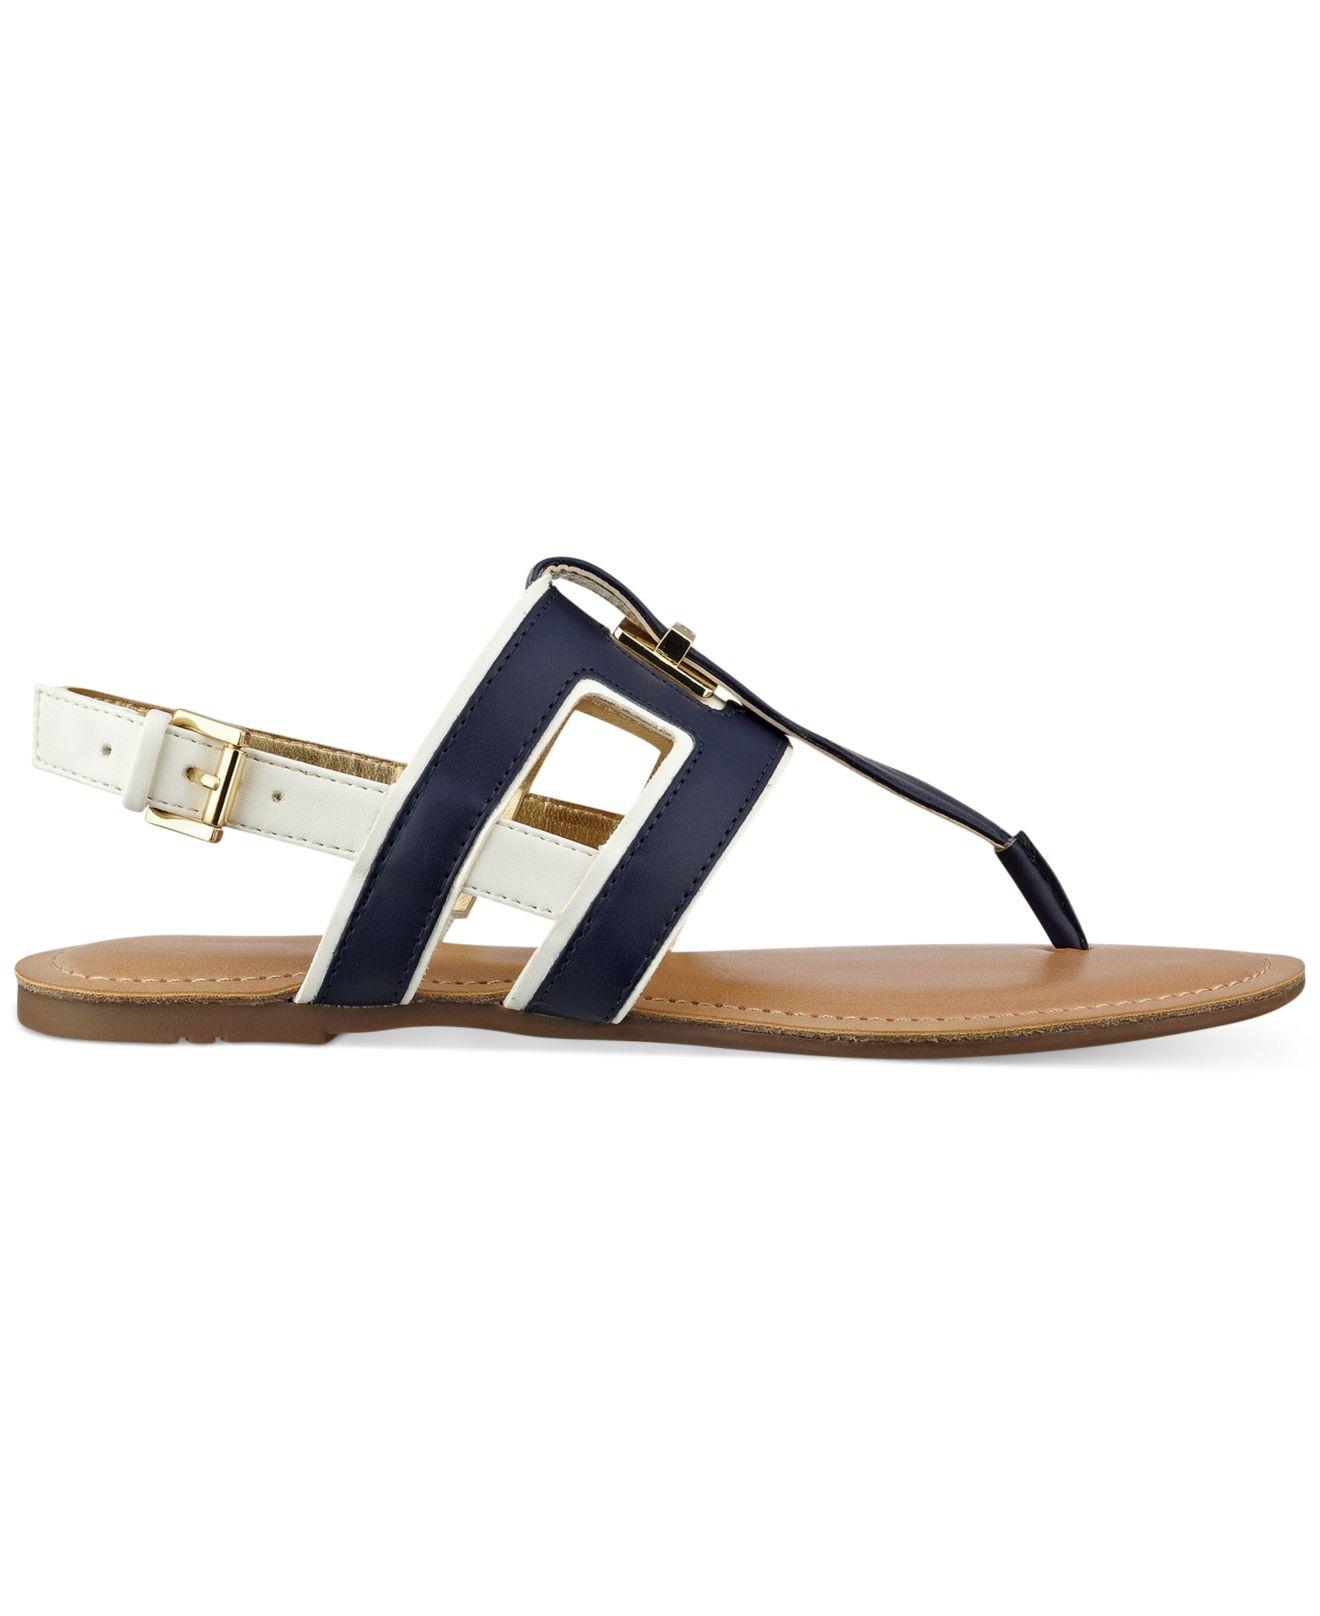 strappy sandals - Blue Tommy Hilfiger i1DH3Ir